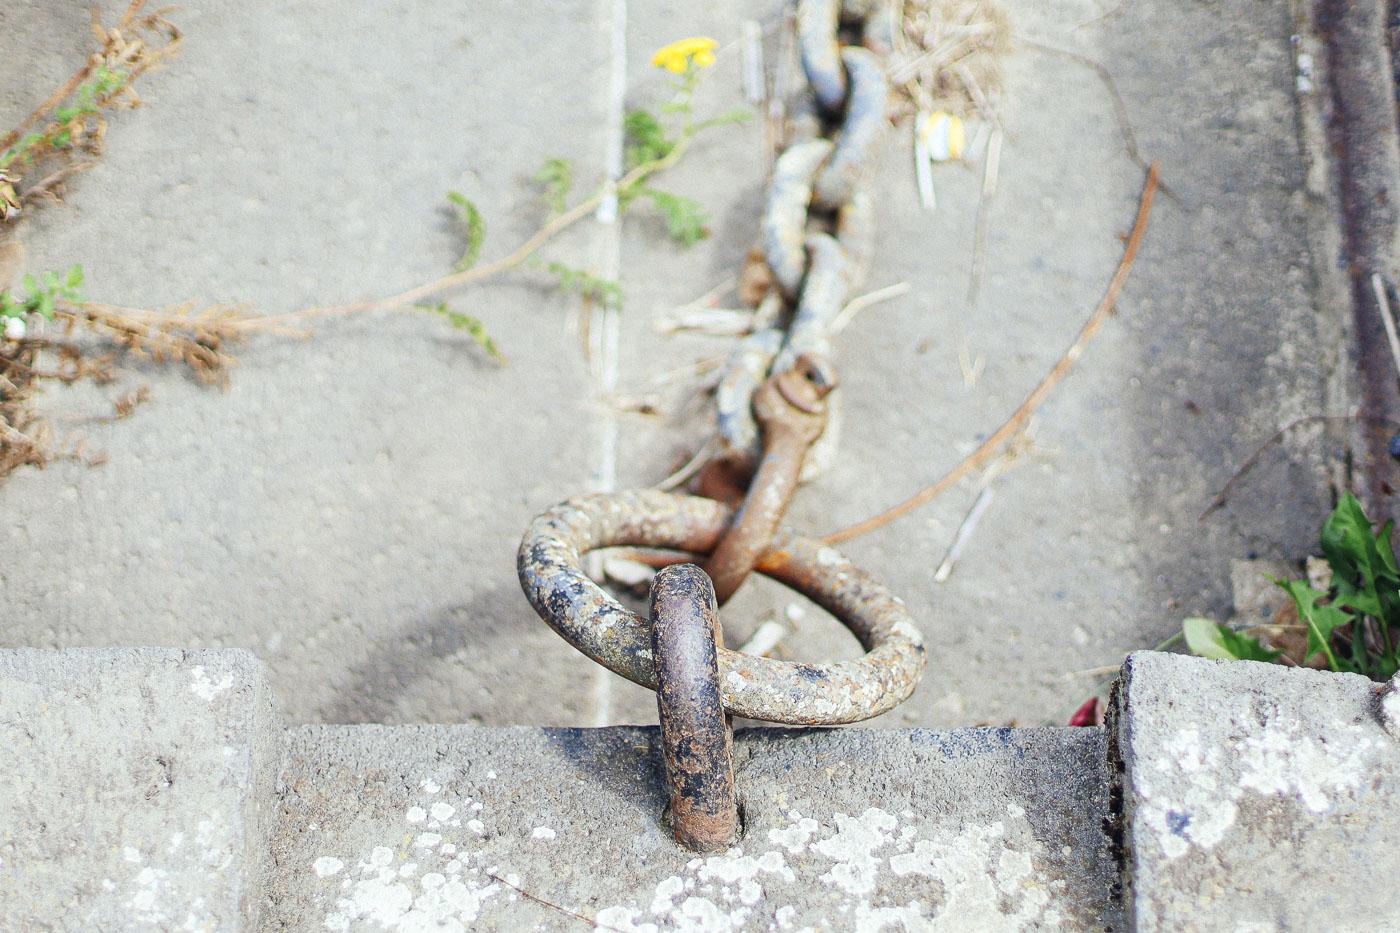 Stahlkette an Befestigung am Rheinufer